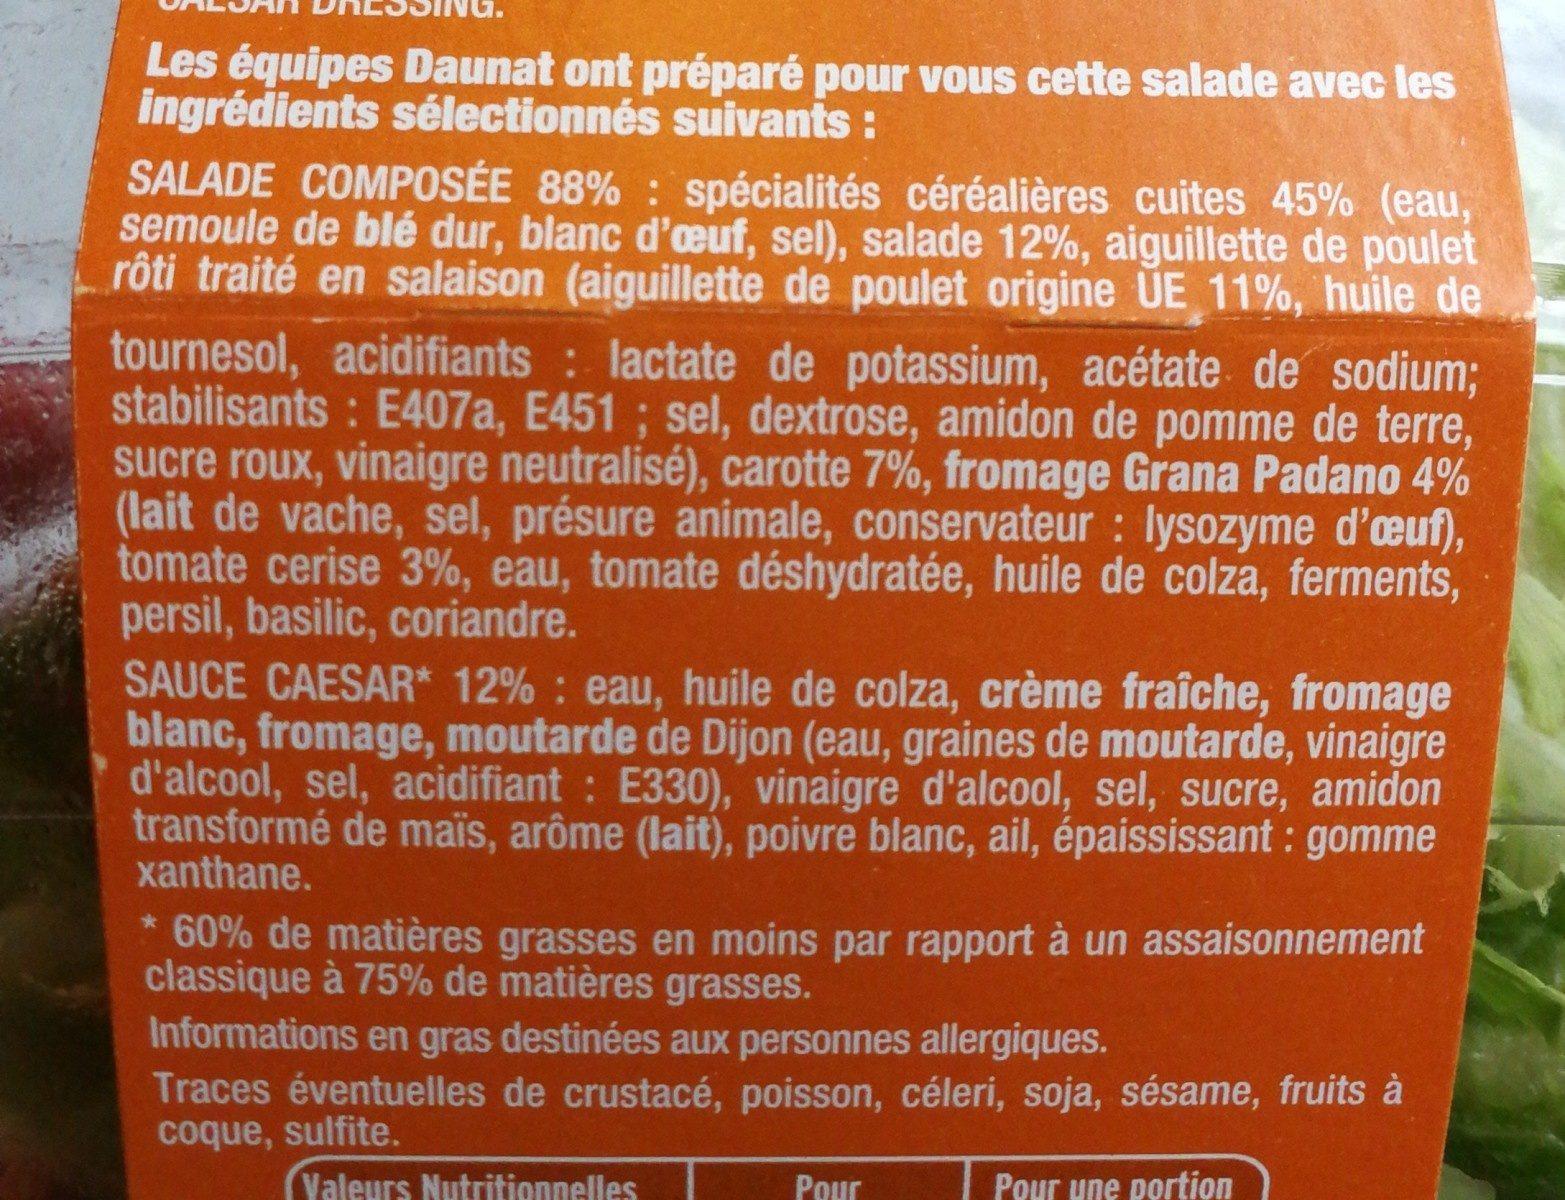 La Caesar poulet grana padano - Ingrédients - fr